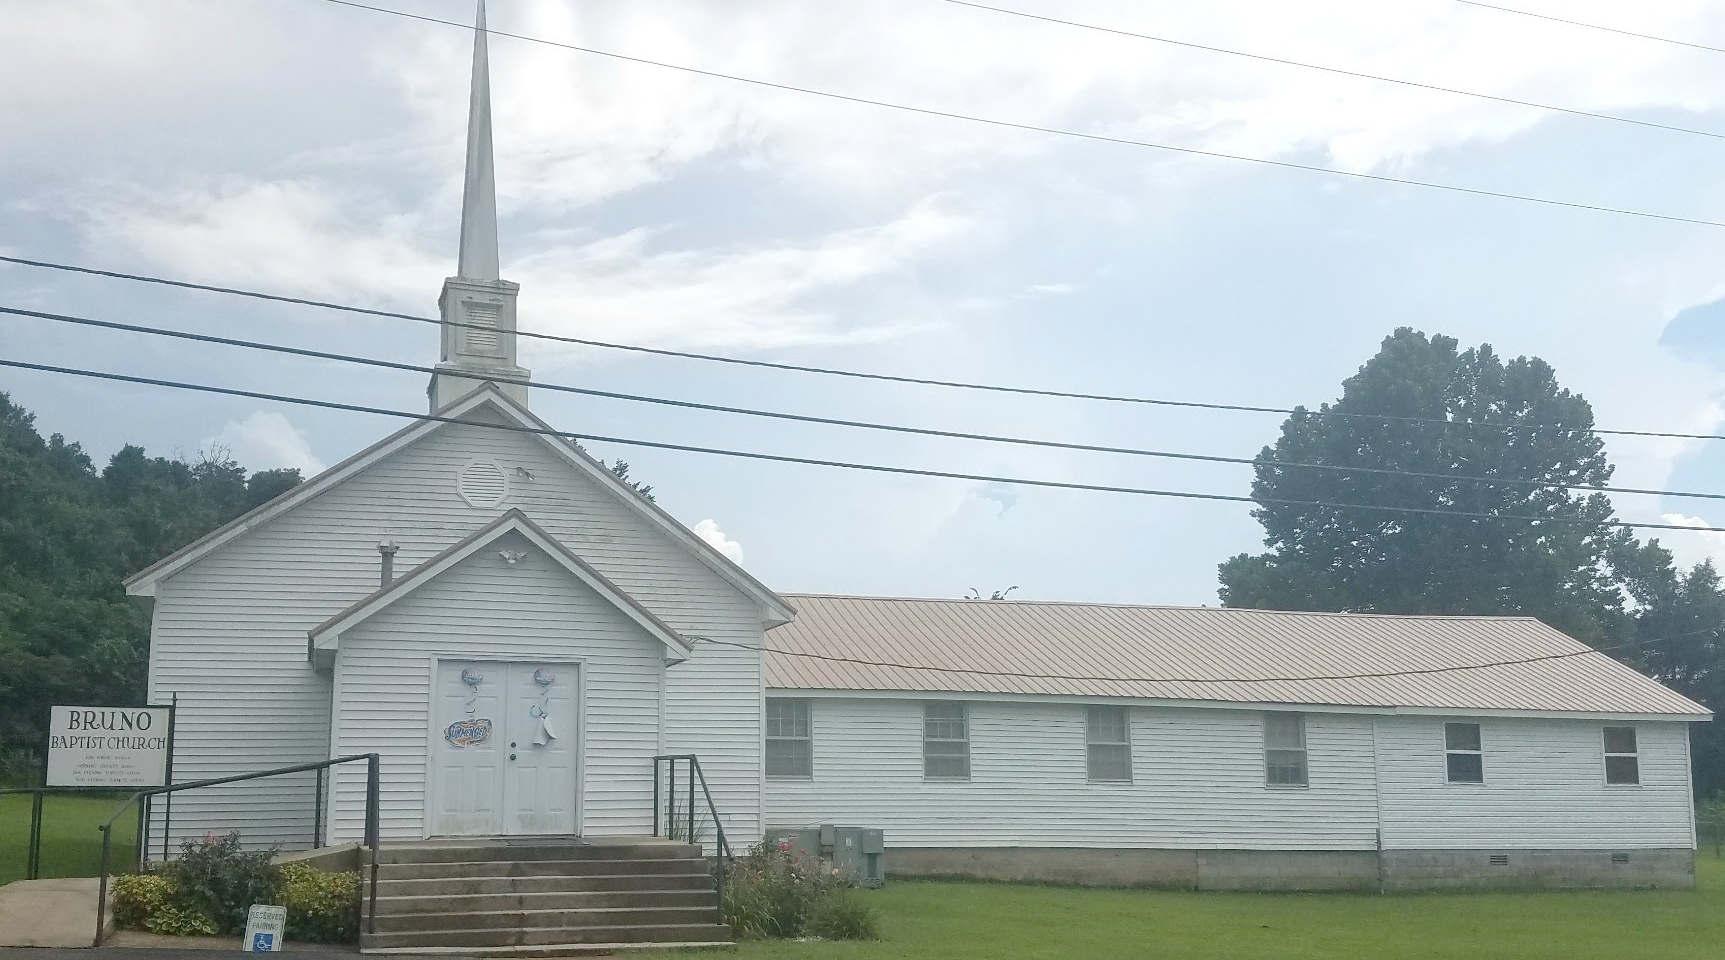 Bruno Baptist Church